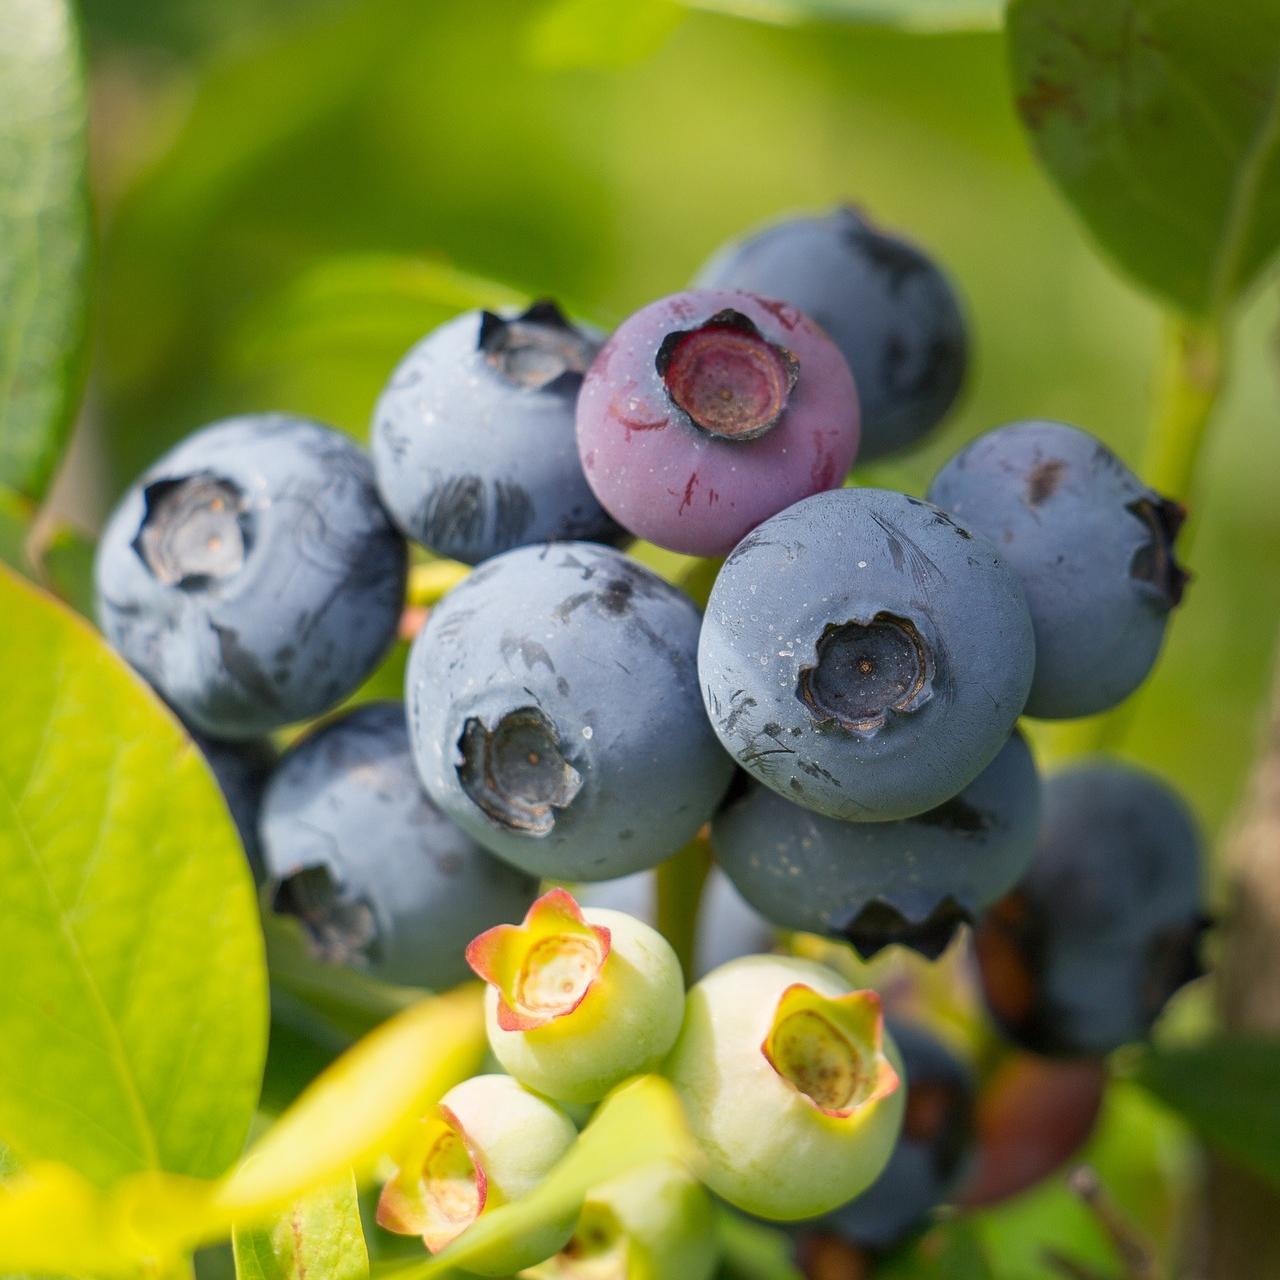 blueberry-2281677_1920.jpg